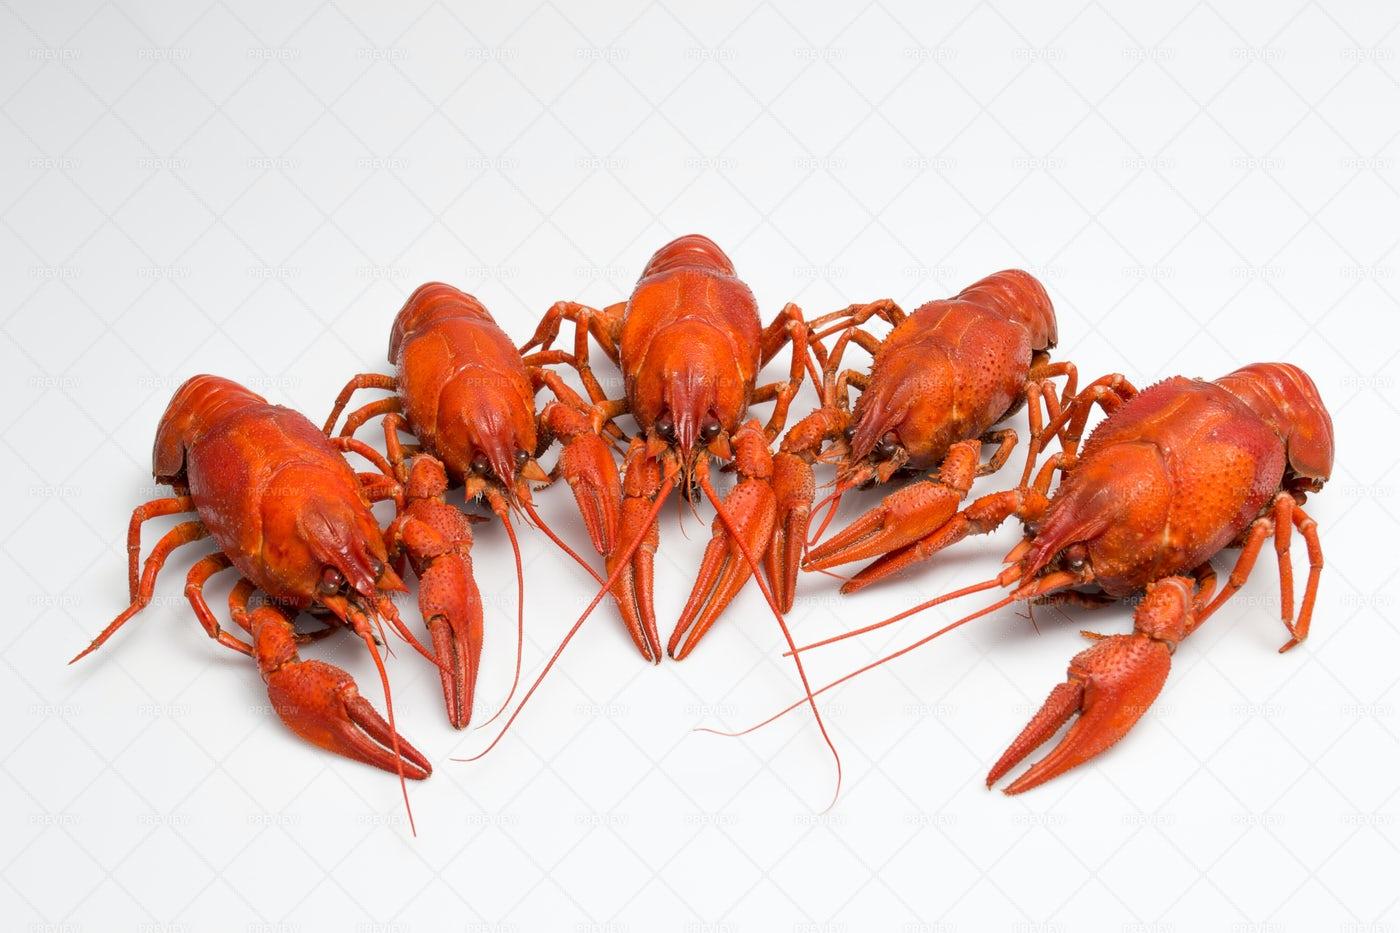 Boiled Crawfish: Stock Photos